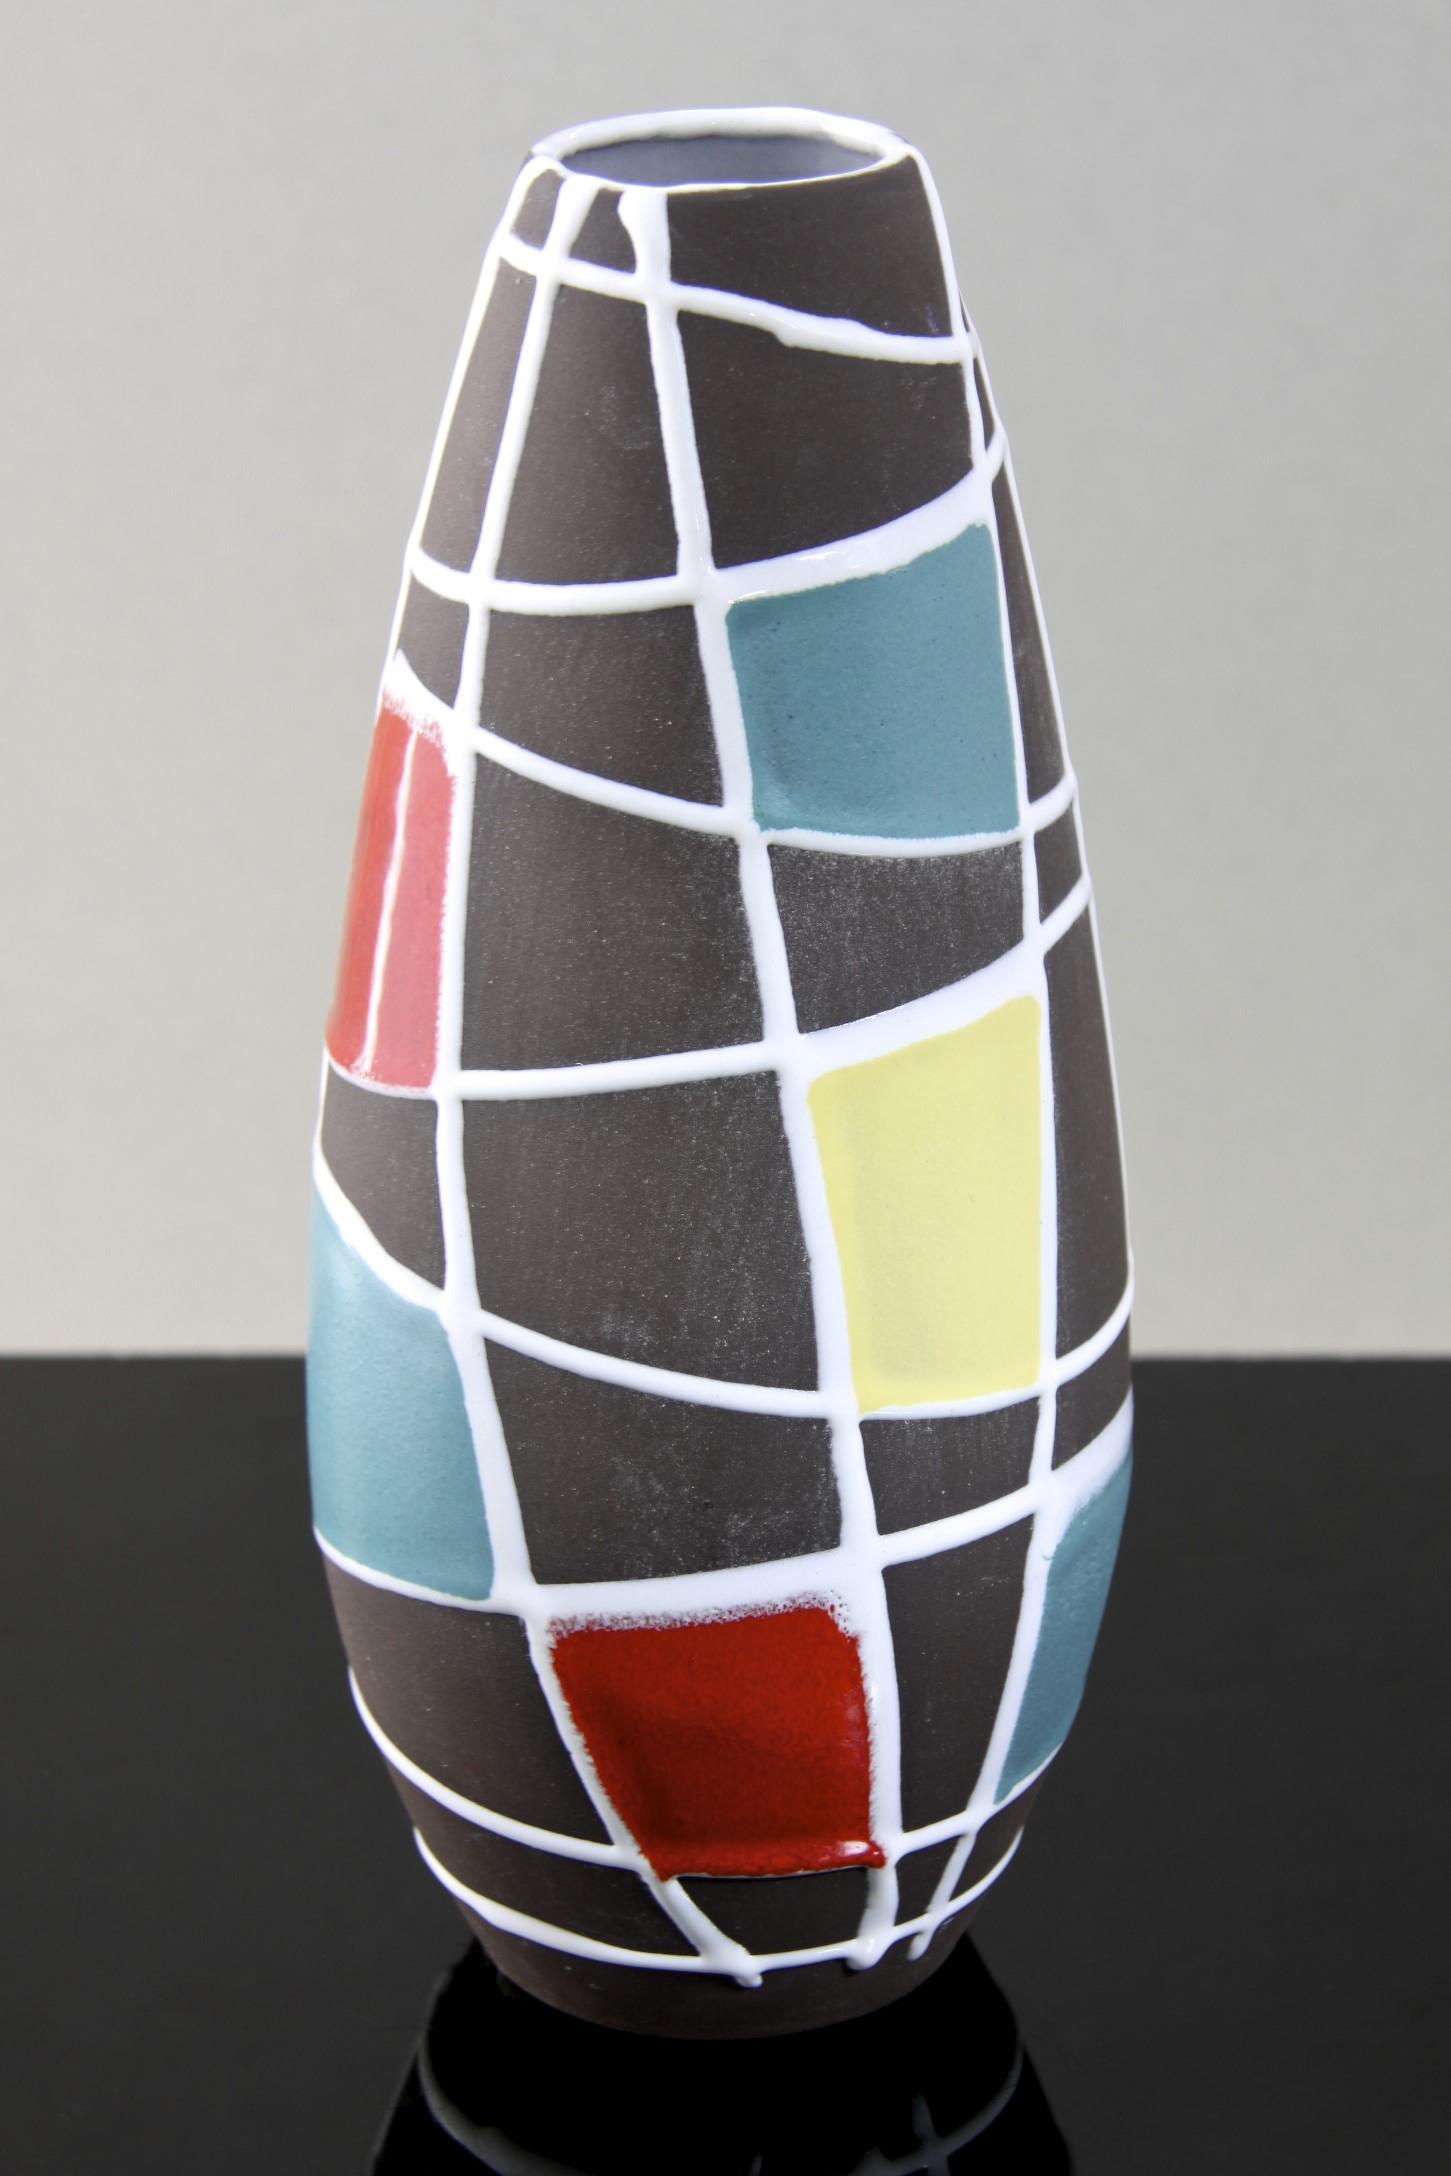 keramik vaser retro Schlossberg Keramik 'Kuba' vase, designed by Liesel Spornhauer  keramik vaser retro